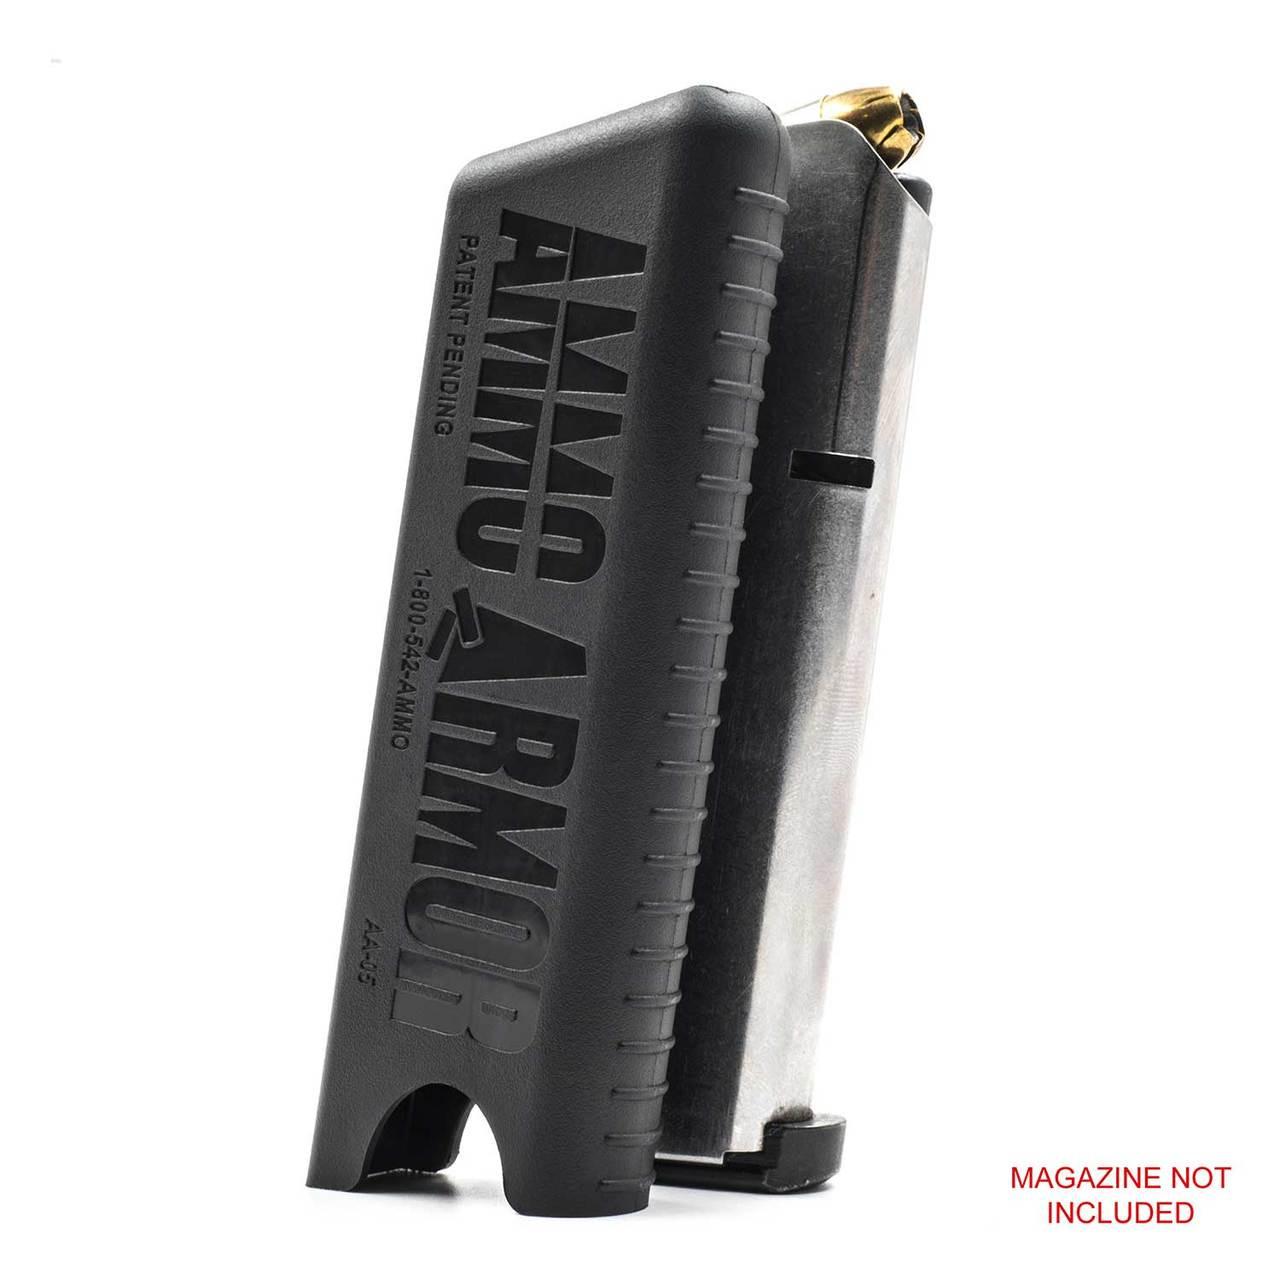 Kimber Master Carry Ultra (.45) Magazine Protector